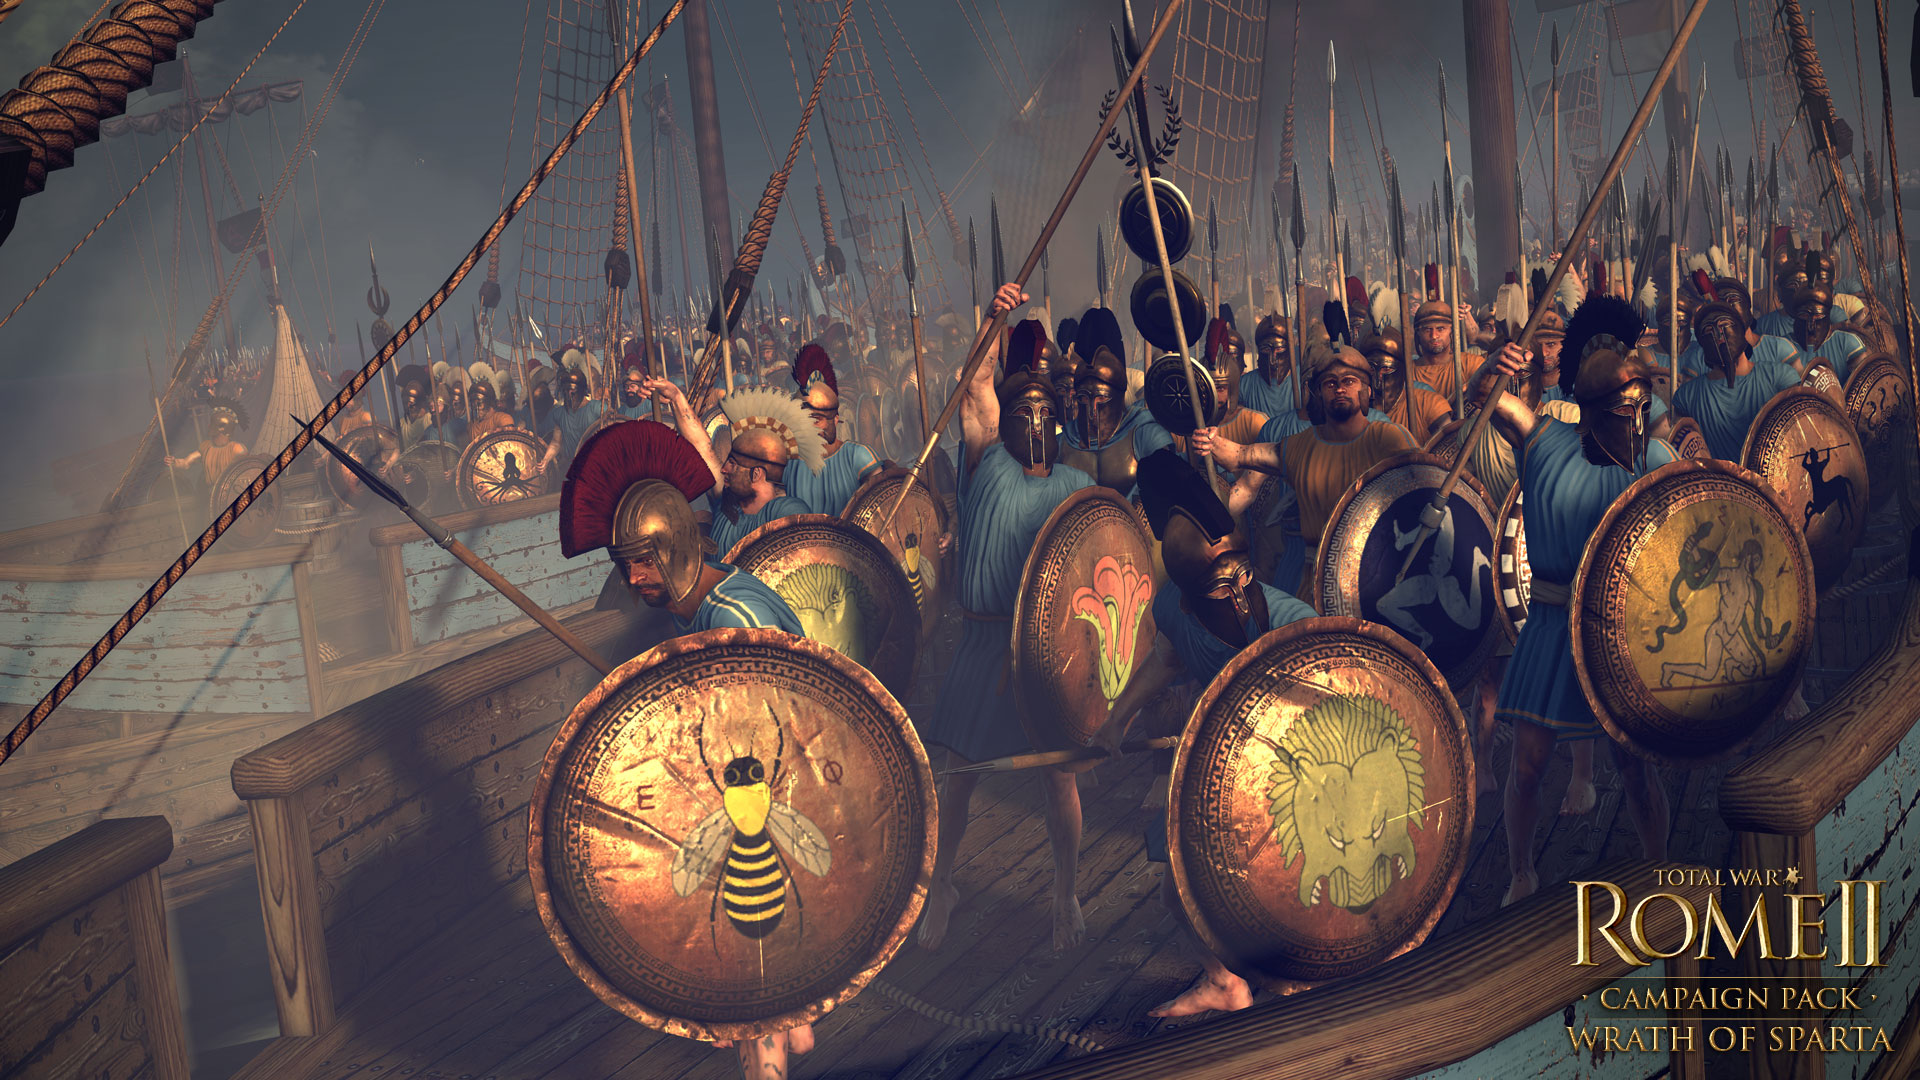 Wrath of Sparta ya está disponible